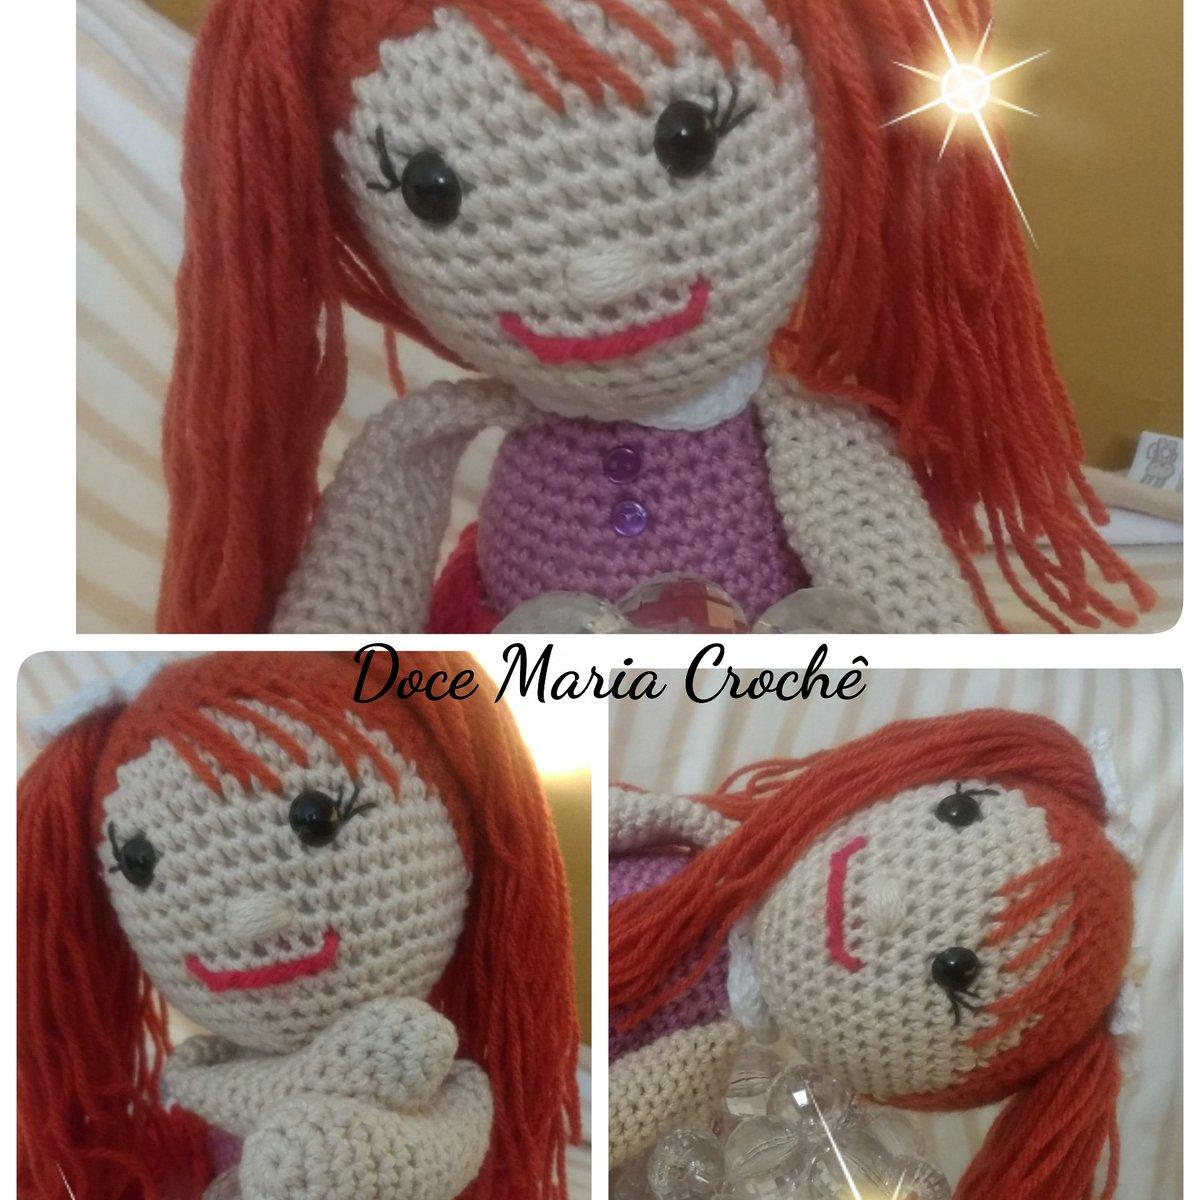 Boneca de crochê: +40 ideias com amigurumi fantásticas ... | 1200x1200